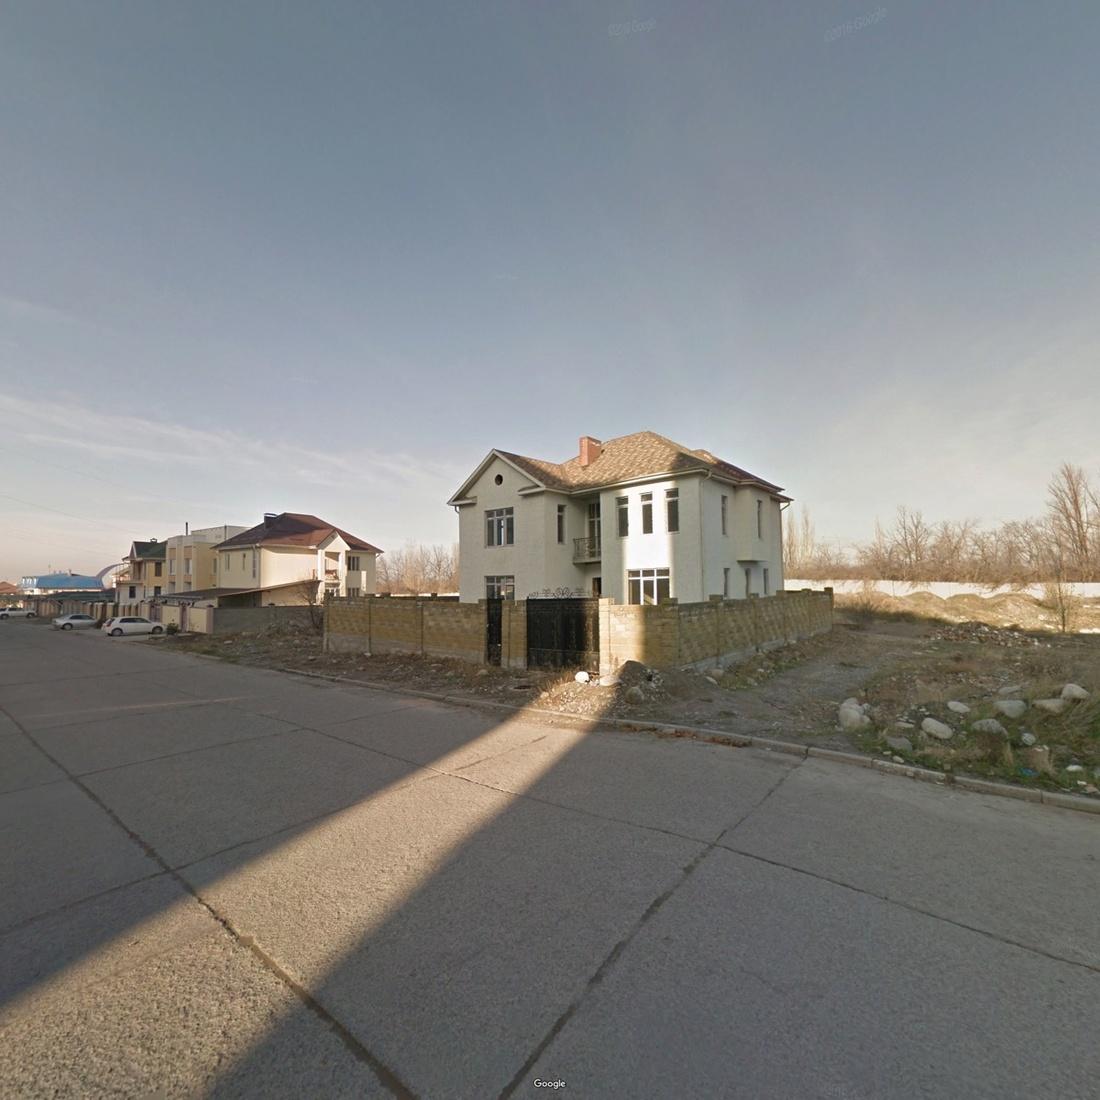 Bishkek, Chuy Province, Kyrgyzstan. Photograph by Jacqui Kenny via Google Street View.